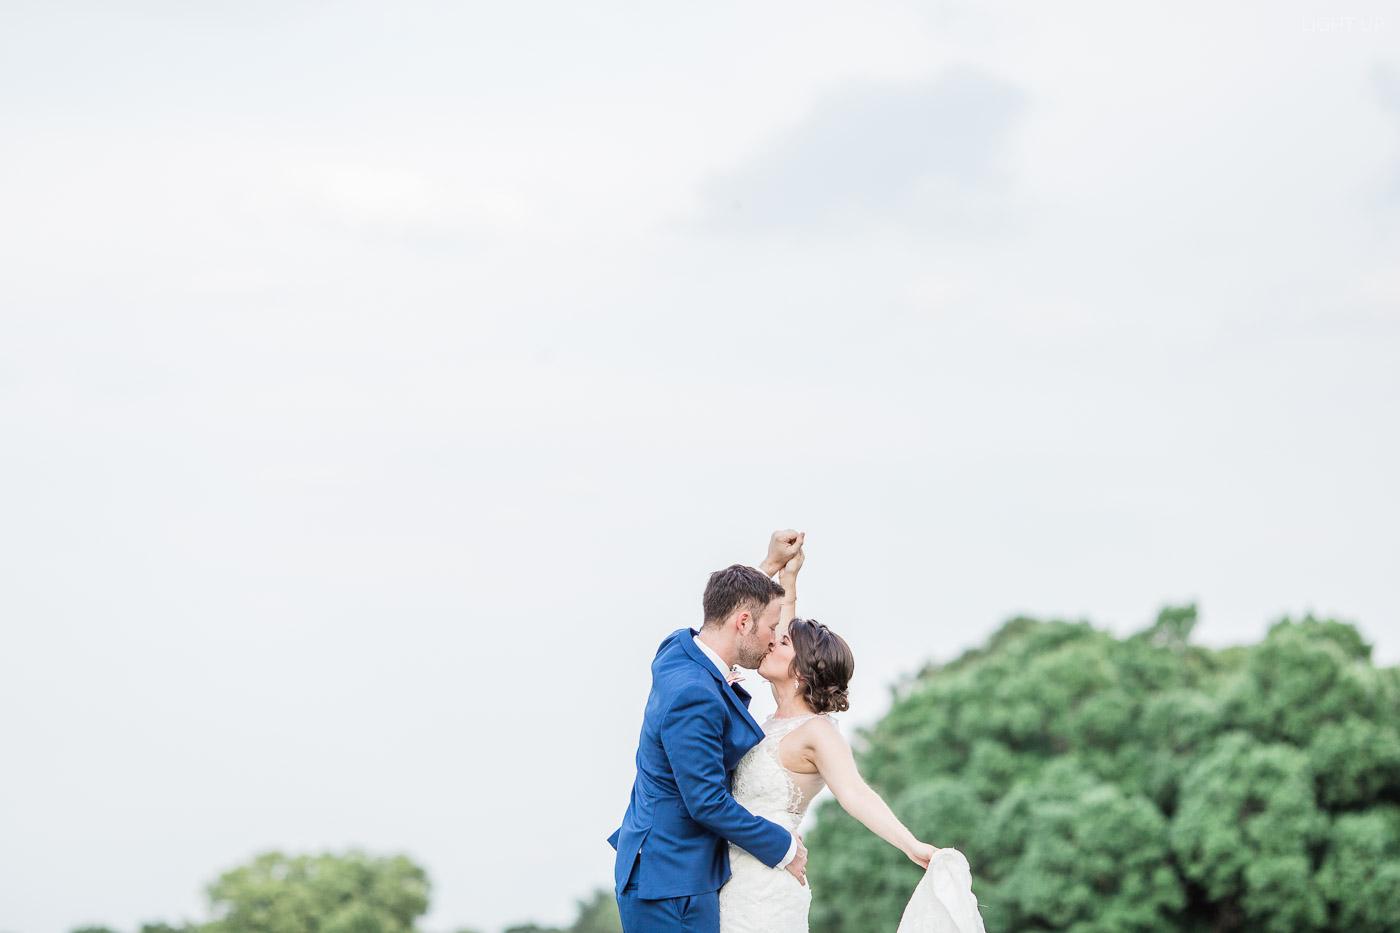 hstoric-dubsdread-wedding-orlando-30.jpg